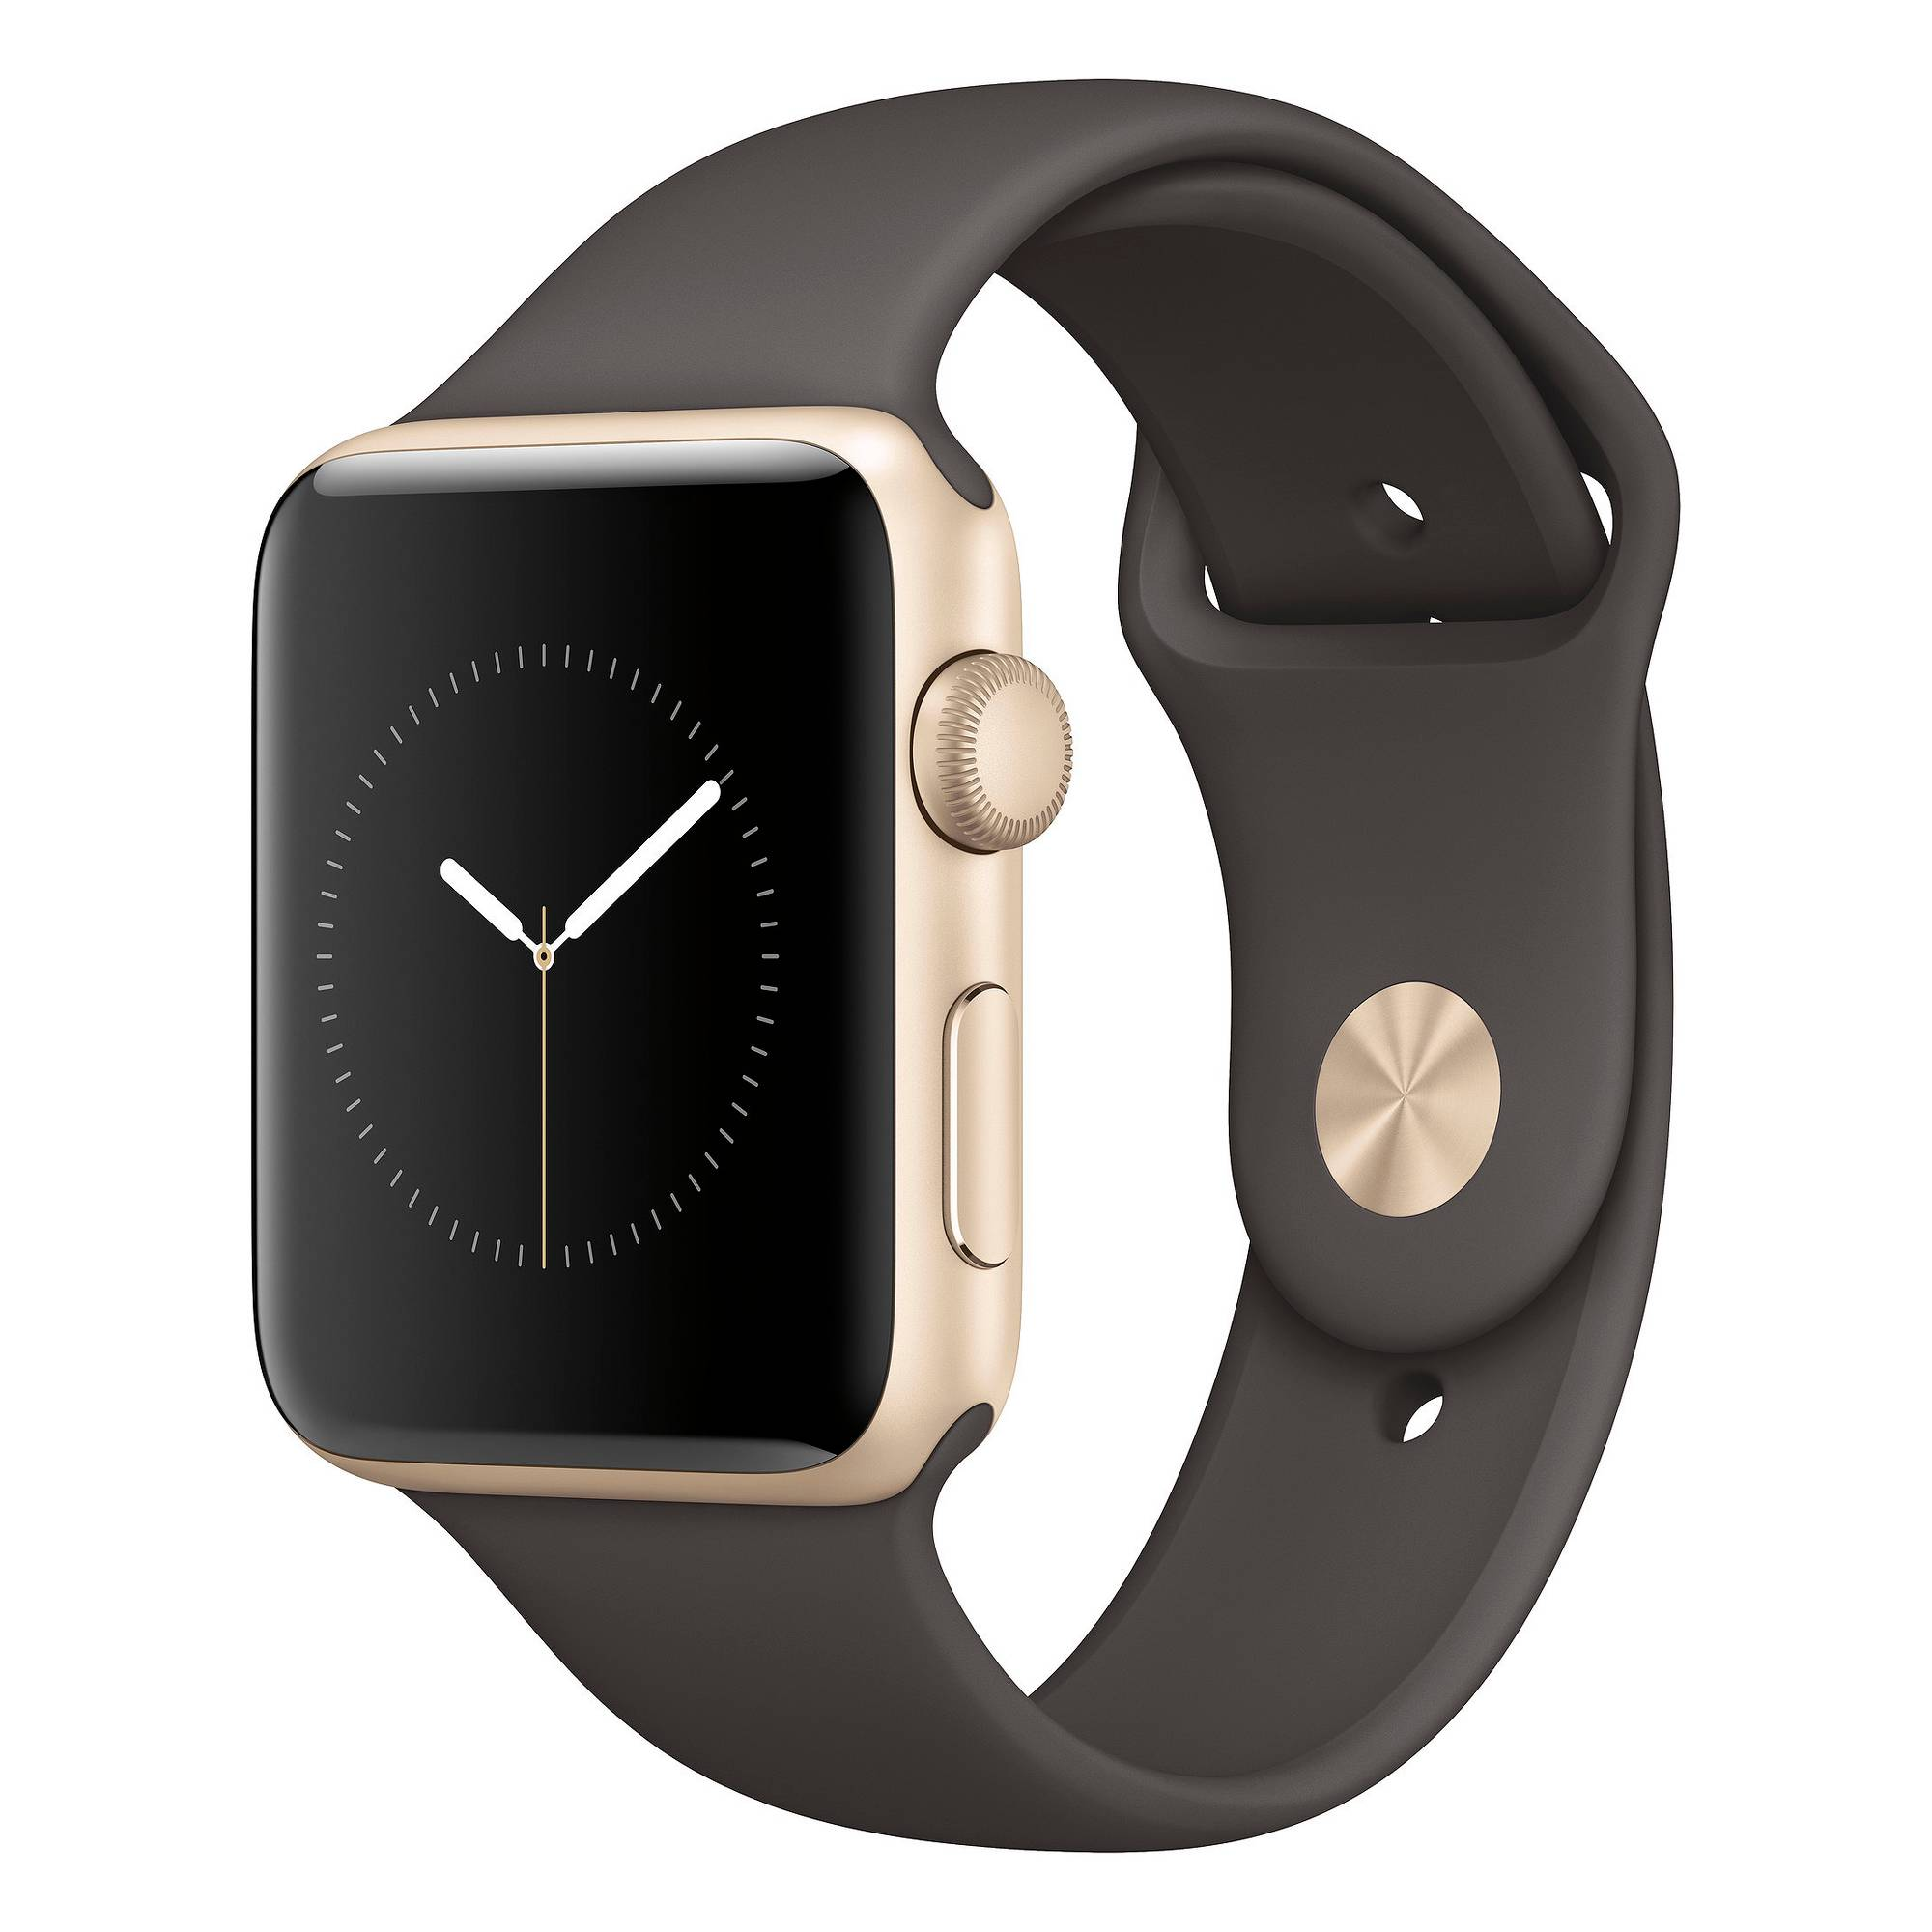 Apple Watch Sale series 2: 42mm $329, 38mm $299 & More + Free S/H @ Target